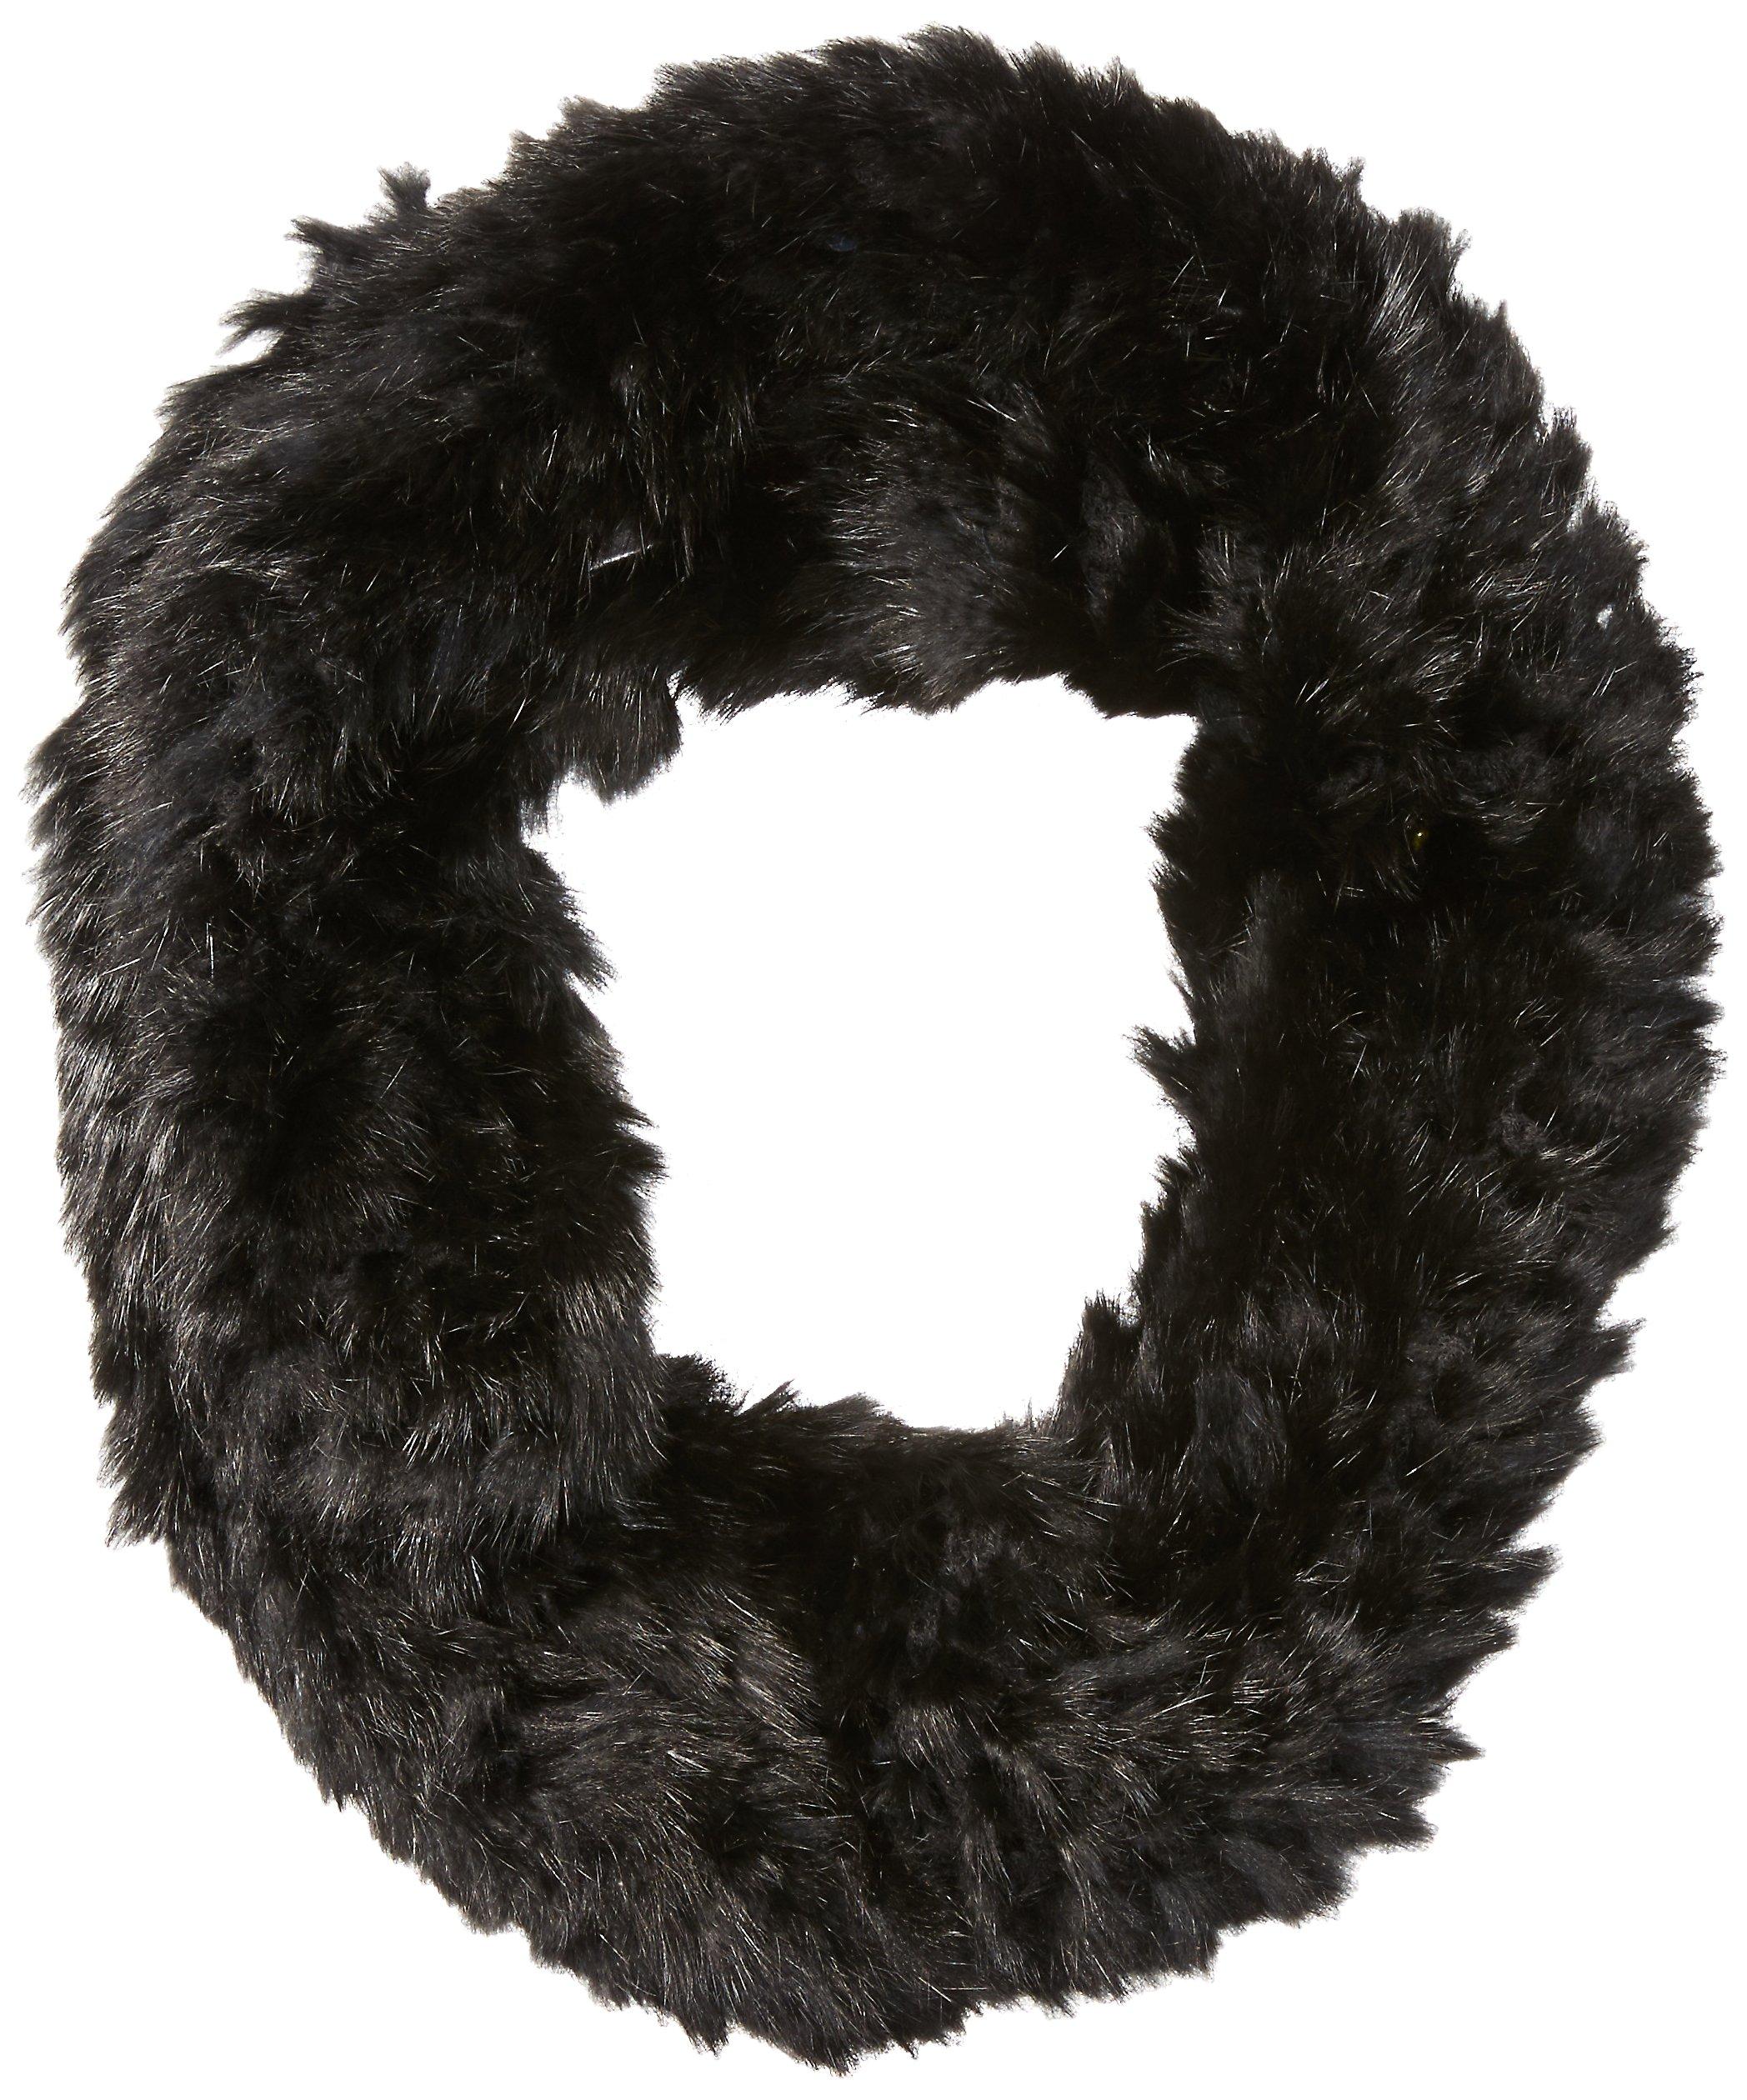 RUDSAK Women's Nantes Fur Eternity Scarf, Black/Black, One Size